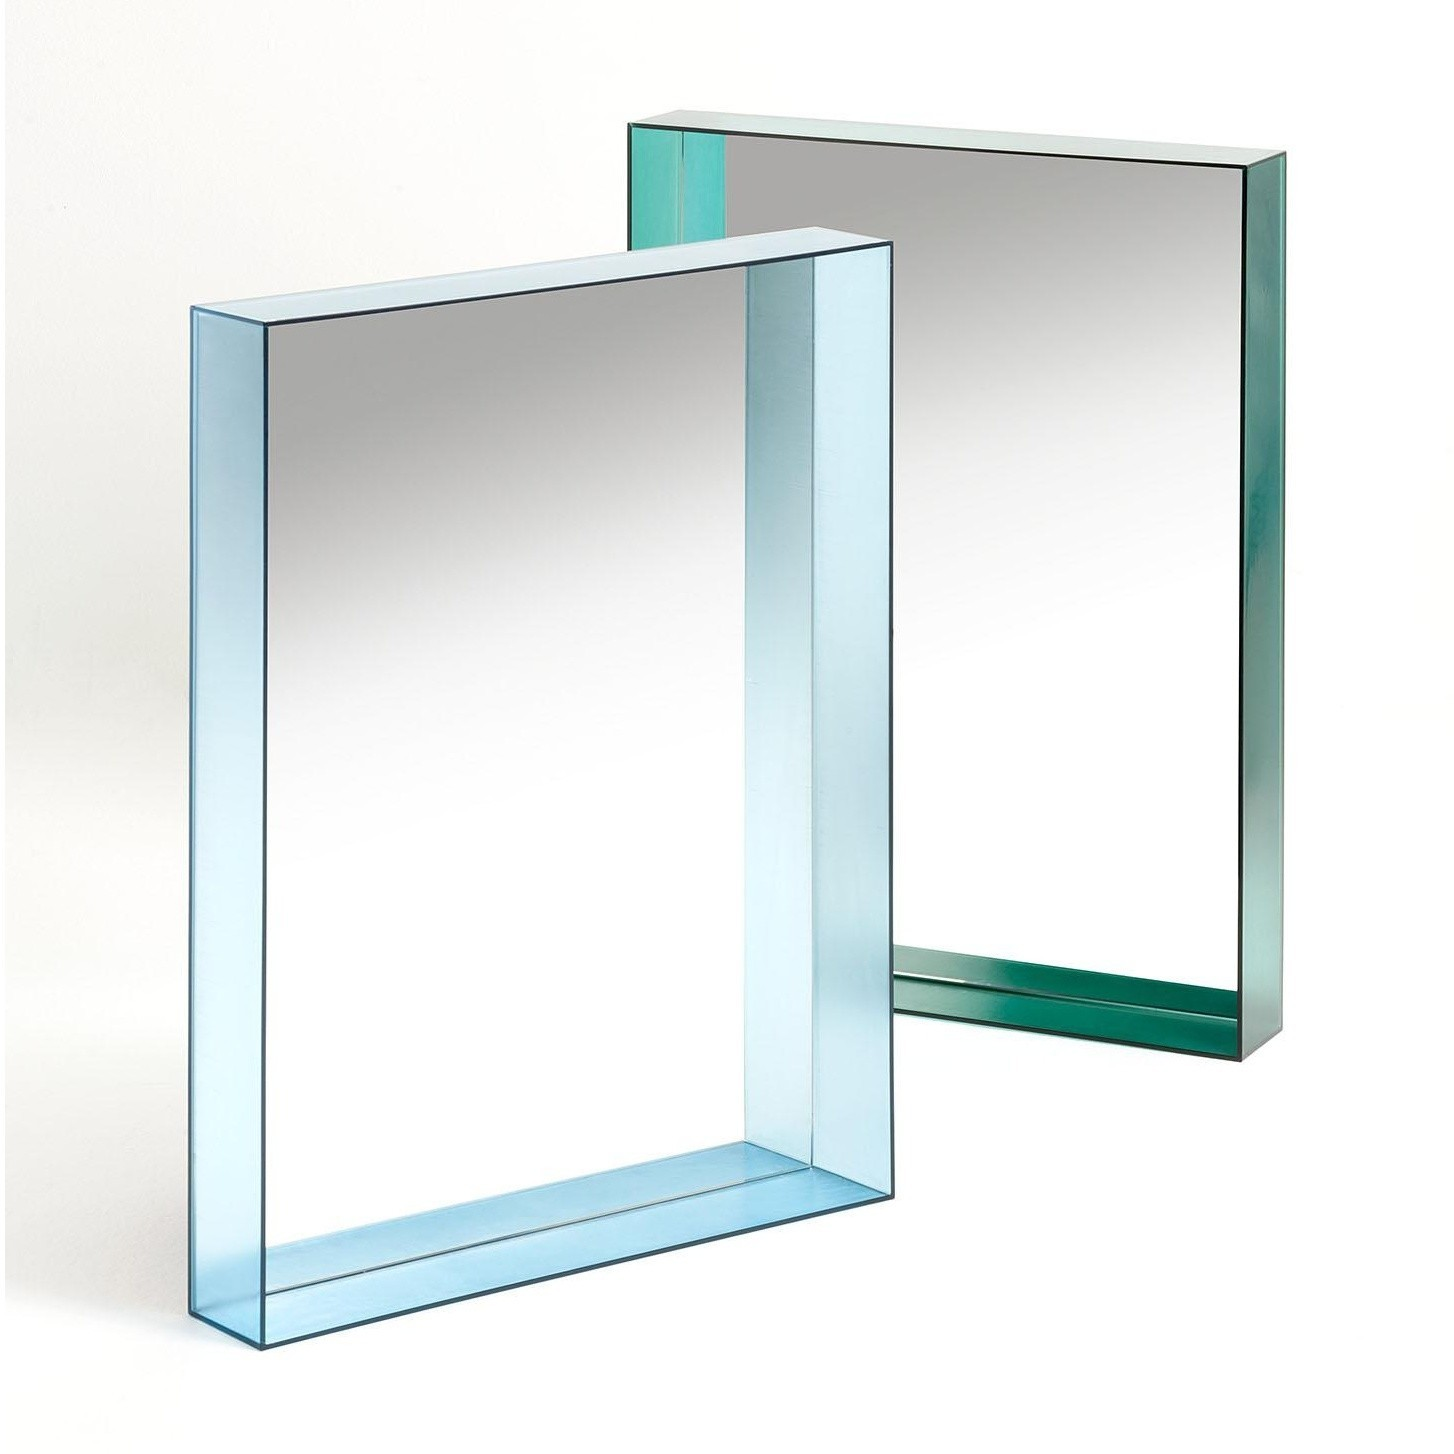 kartell only me mirror 50x70 ambientedirect. Black Bedroom Furniture Sets. Home Design Ideas